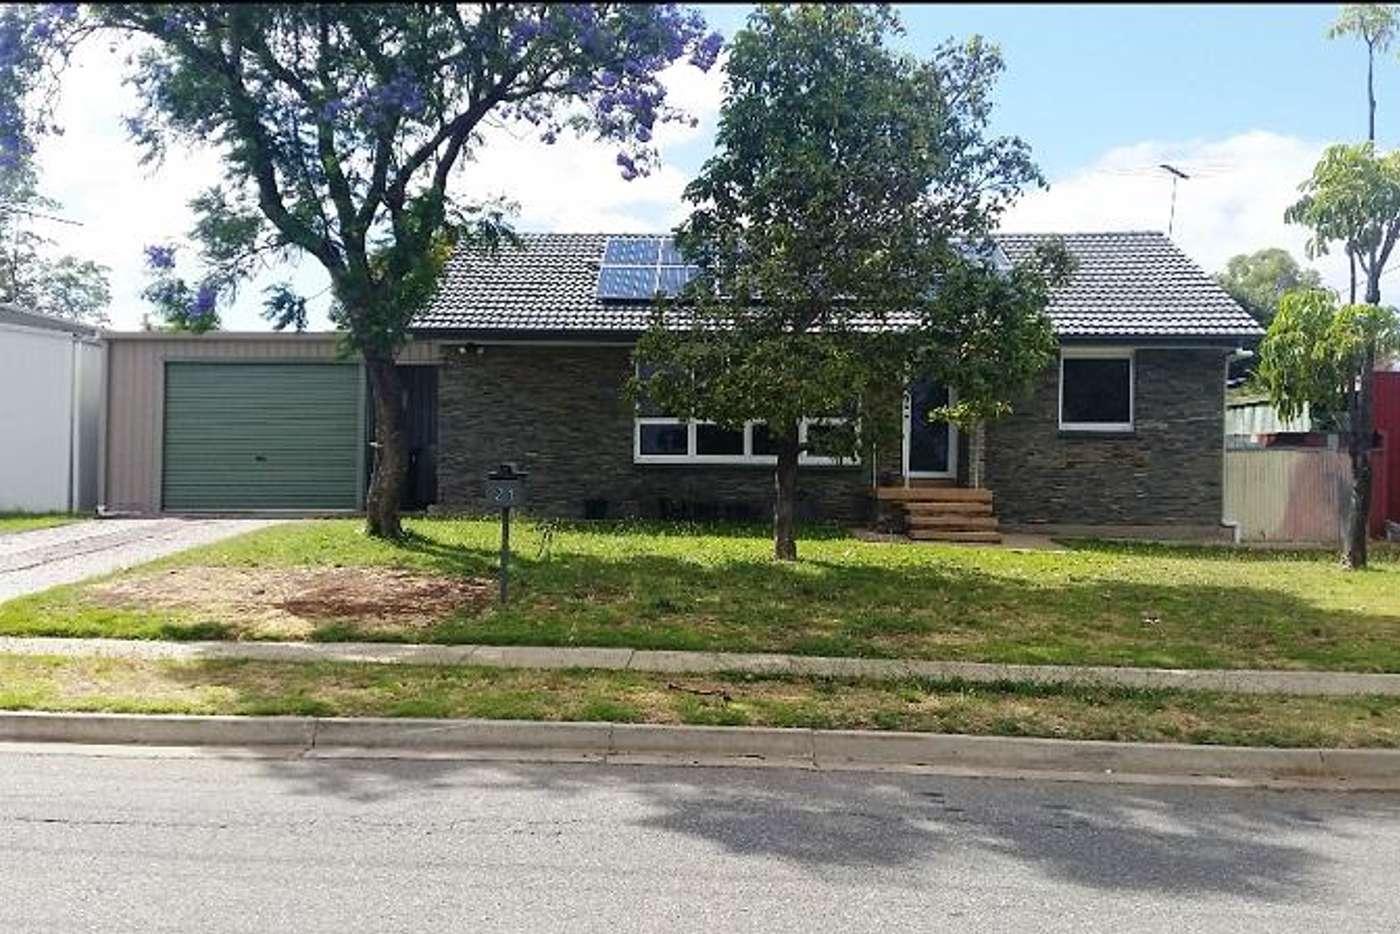 Main view of Homely house listing, 21 Winara Drive, Ingle Farm SA 5098